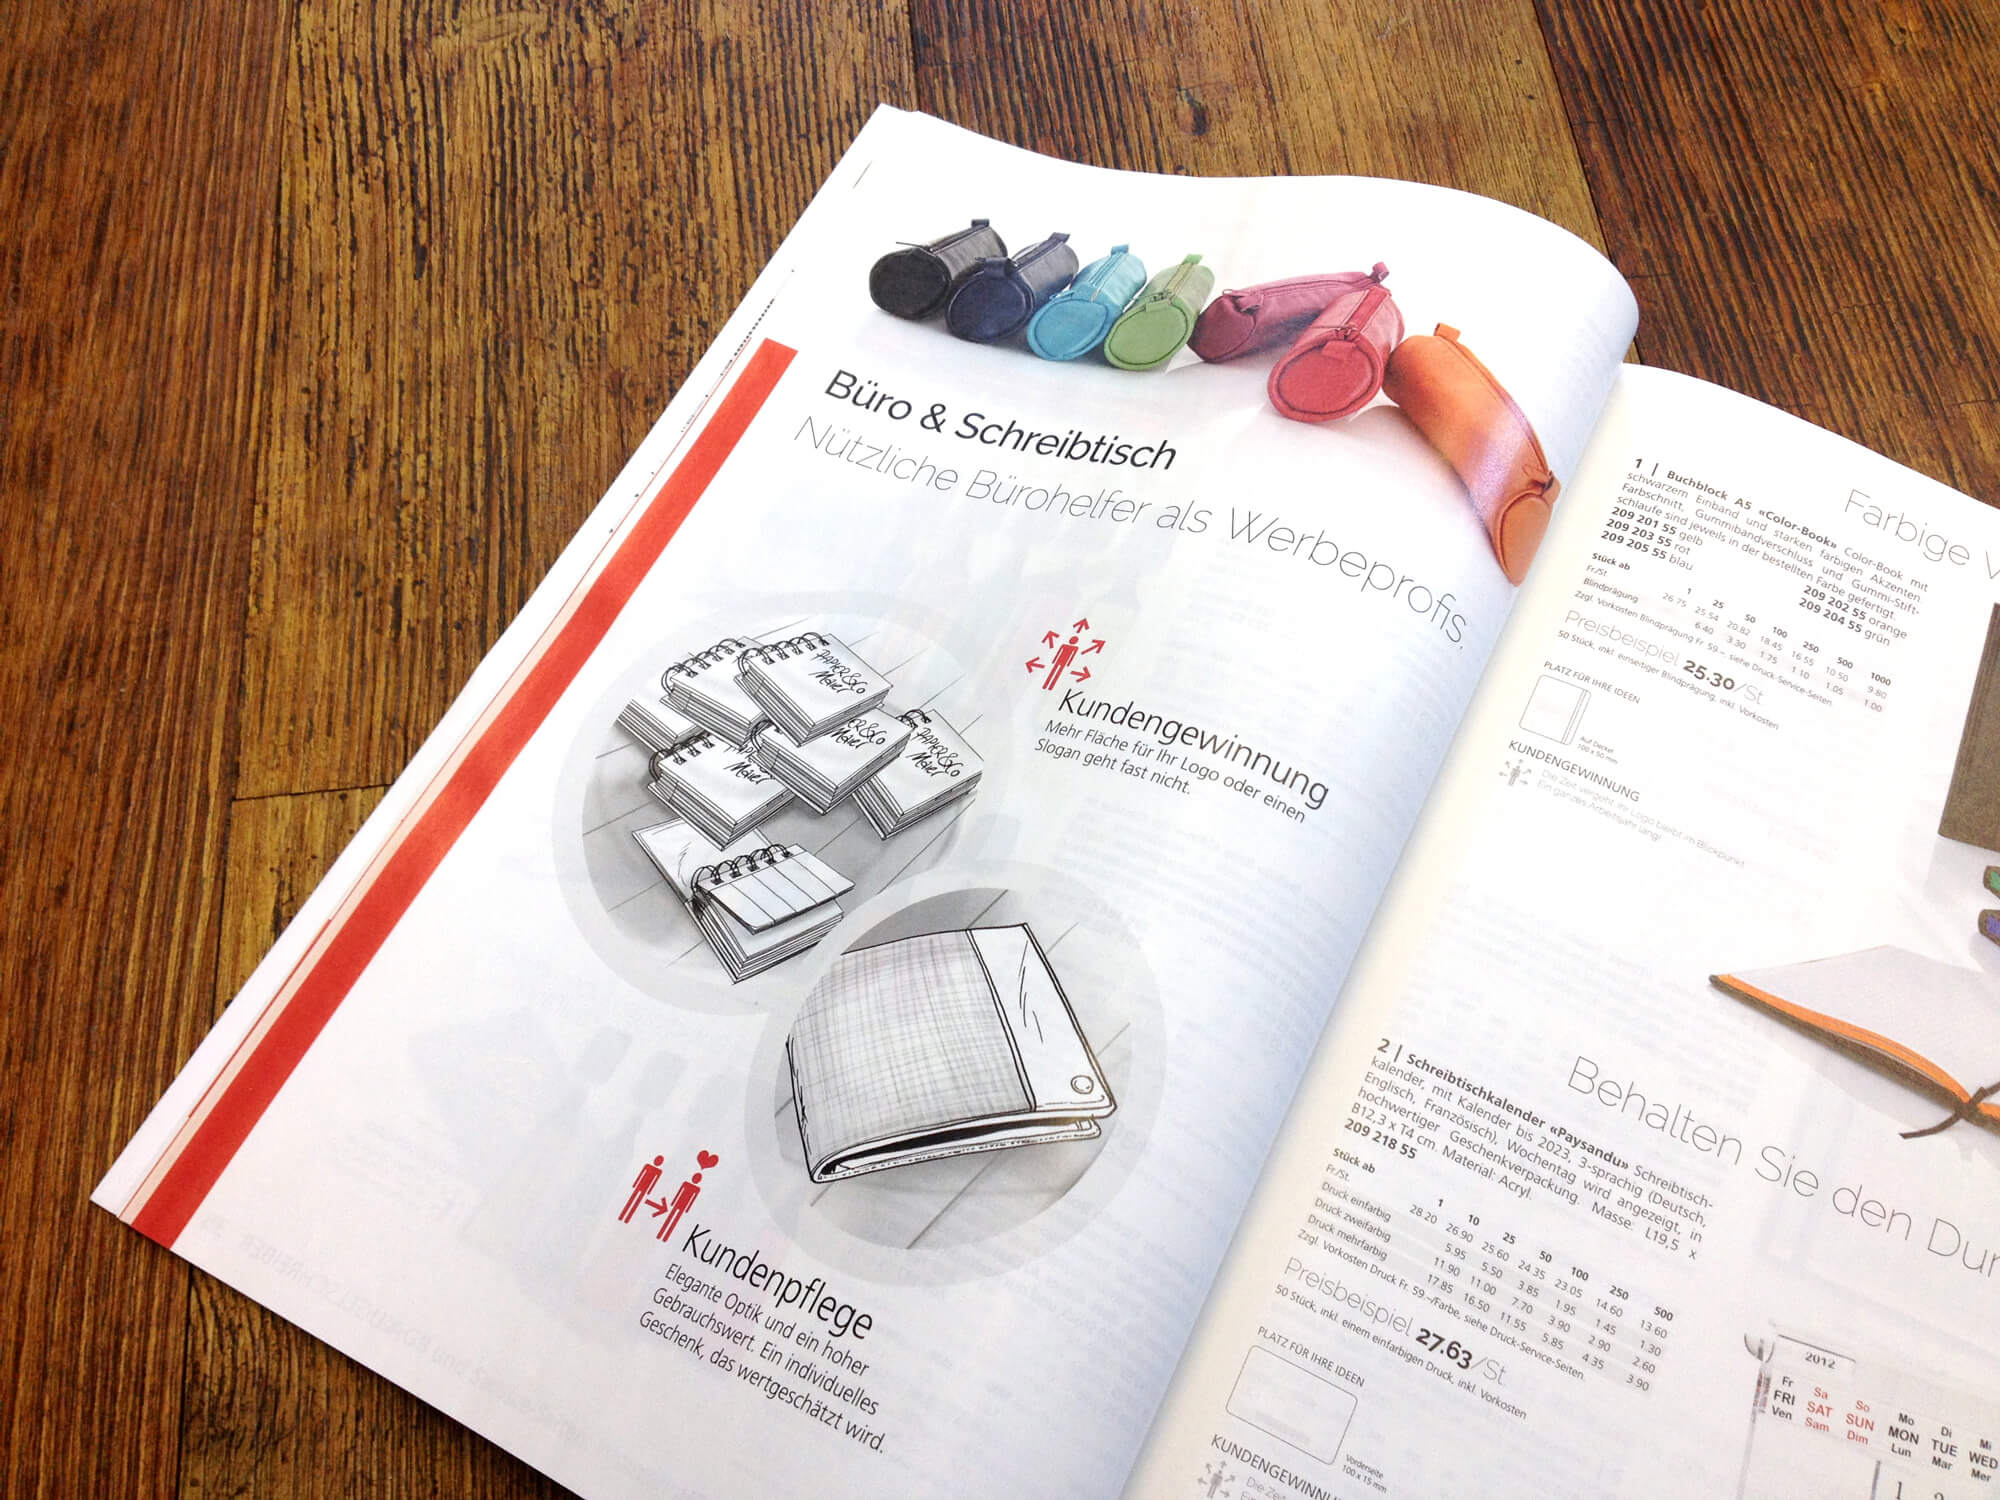 Hach katalog herbst 2015 bzweic Hach katalog